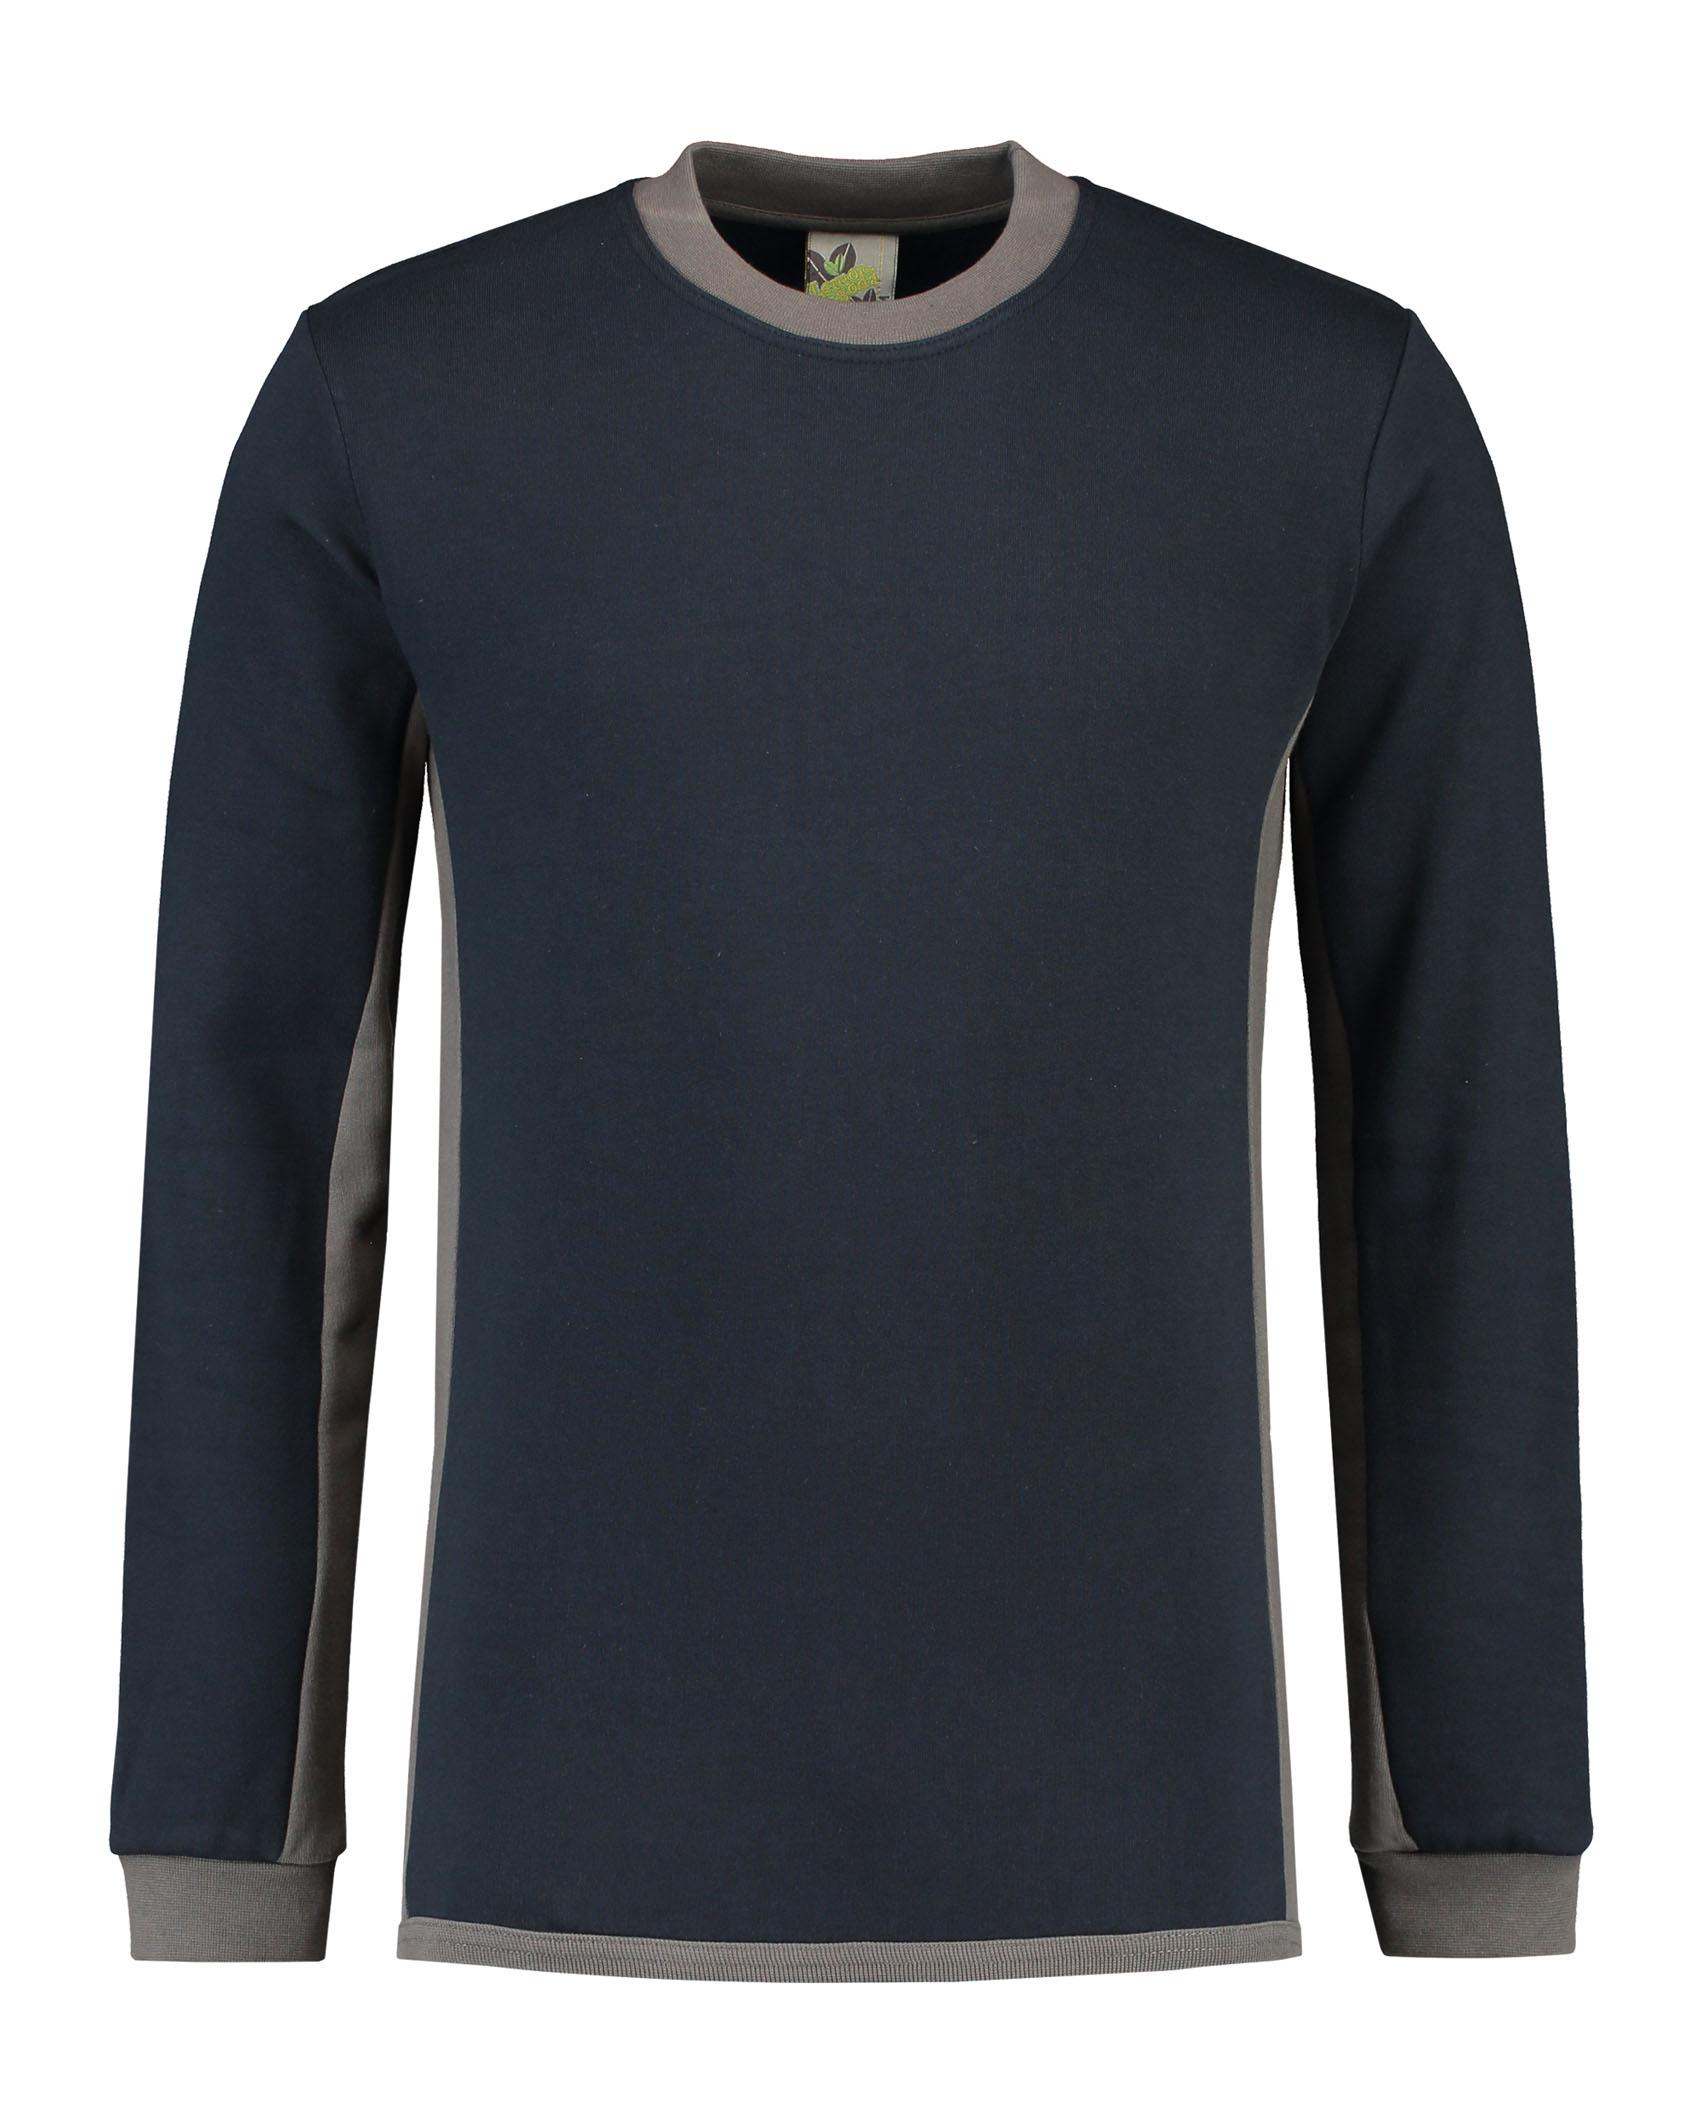 L&S Workwear Sweater